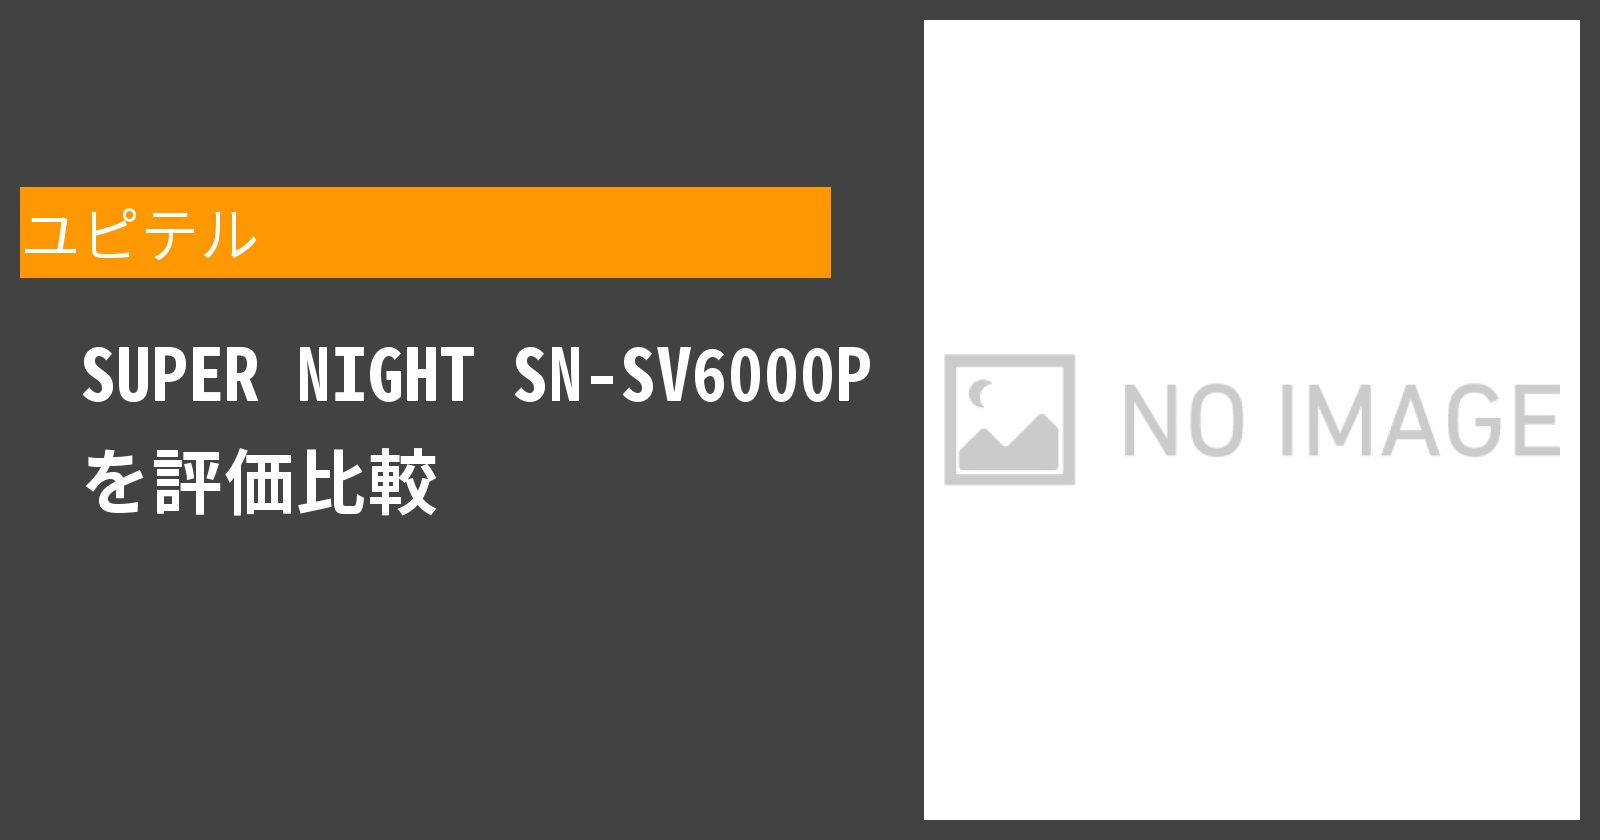 SUPER NIGHT SN-SV6000Pを徹底評価